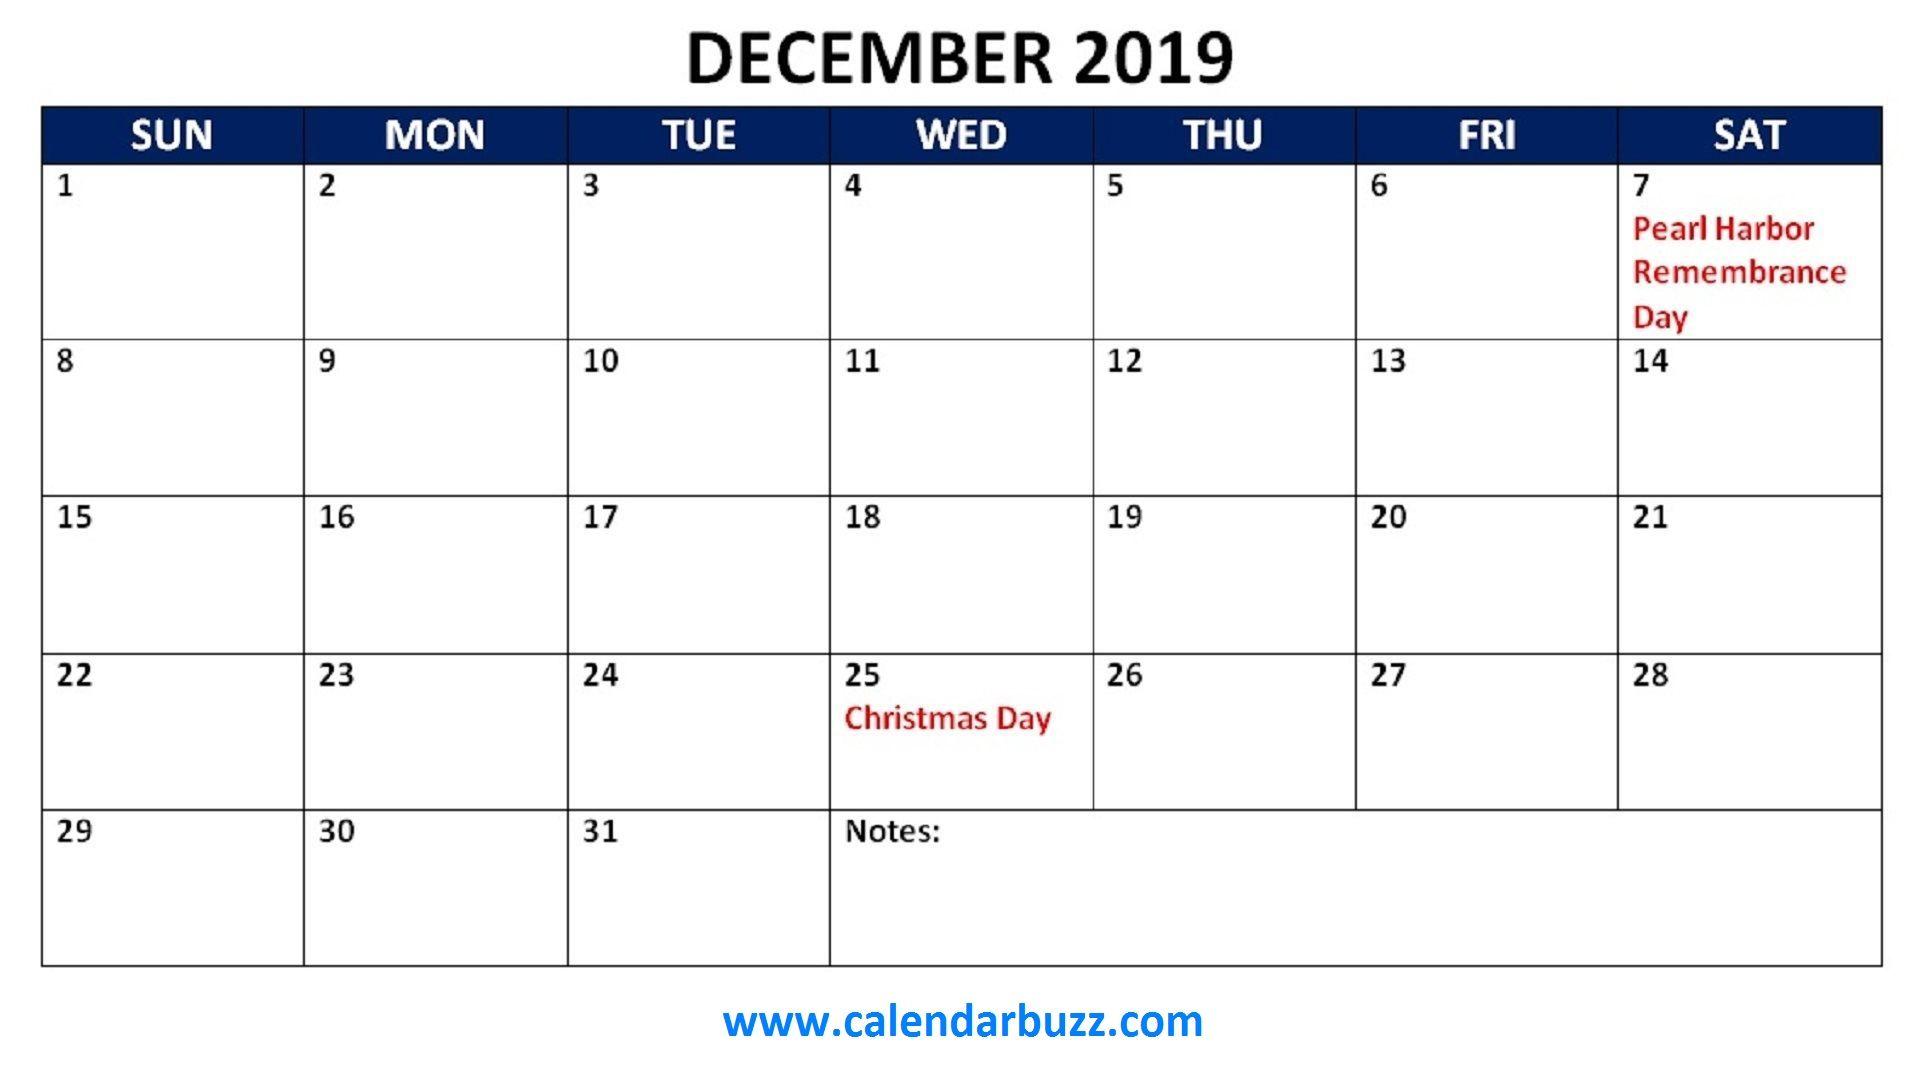 Calendar Of Holidays December 2019 december 2019 holidays calendar printable | 2019 Calendars